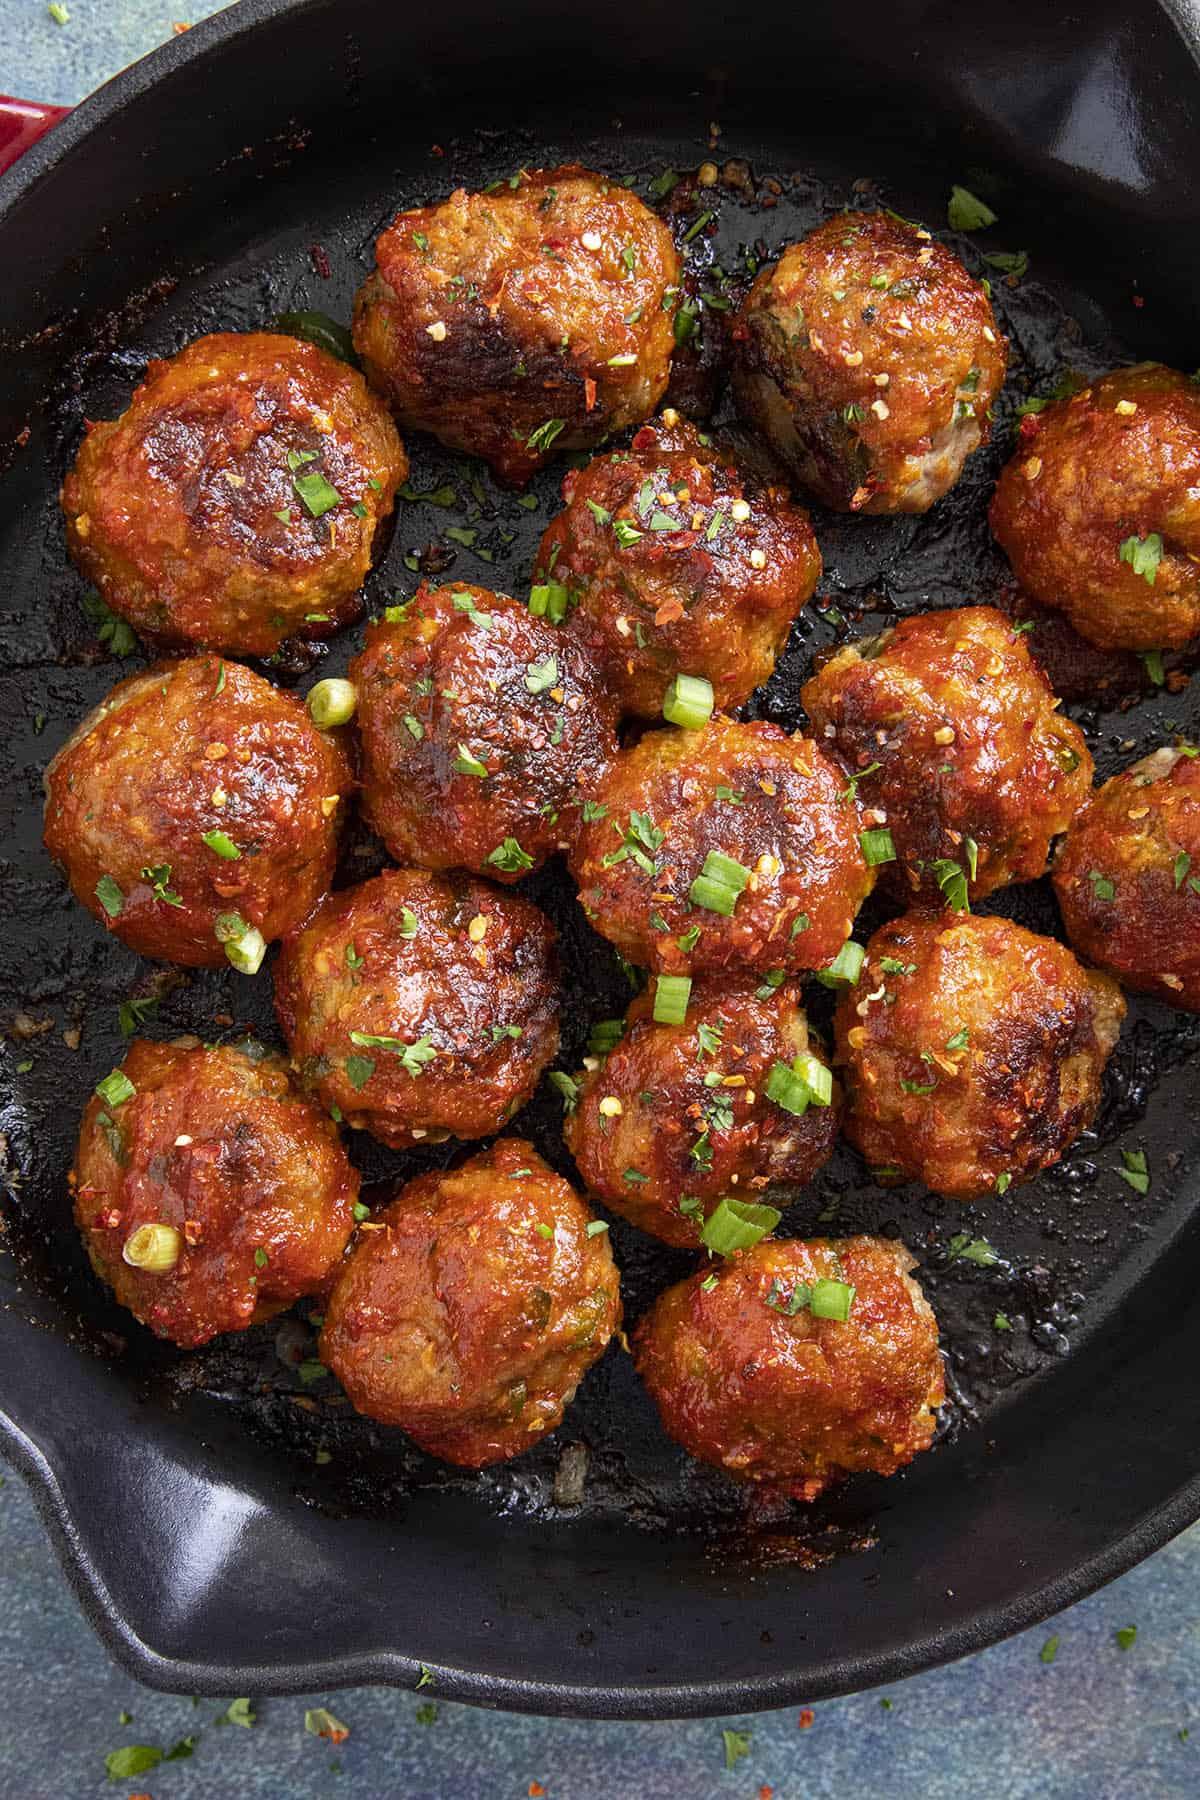 Honey Sriracha Turkey Meatballs in a pan